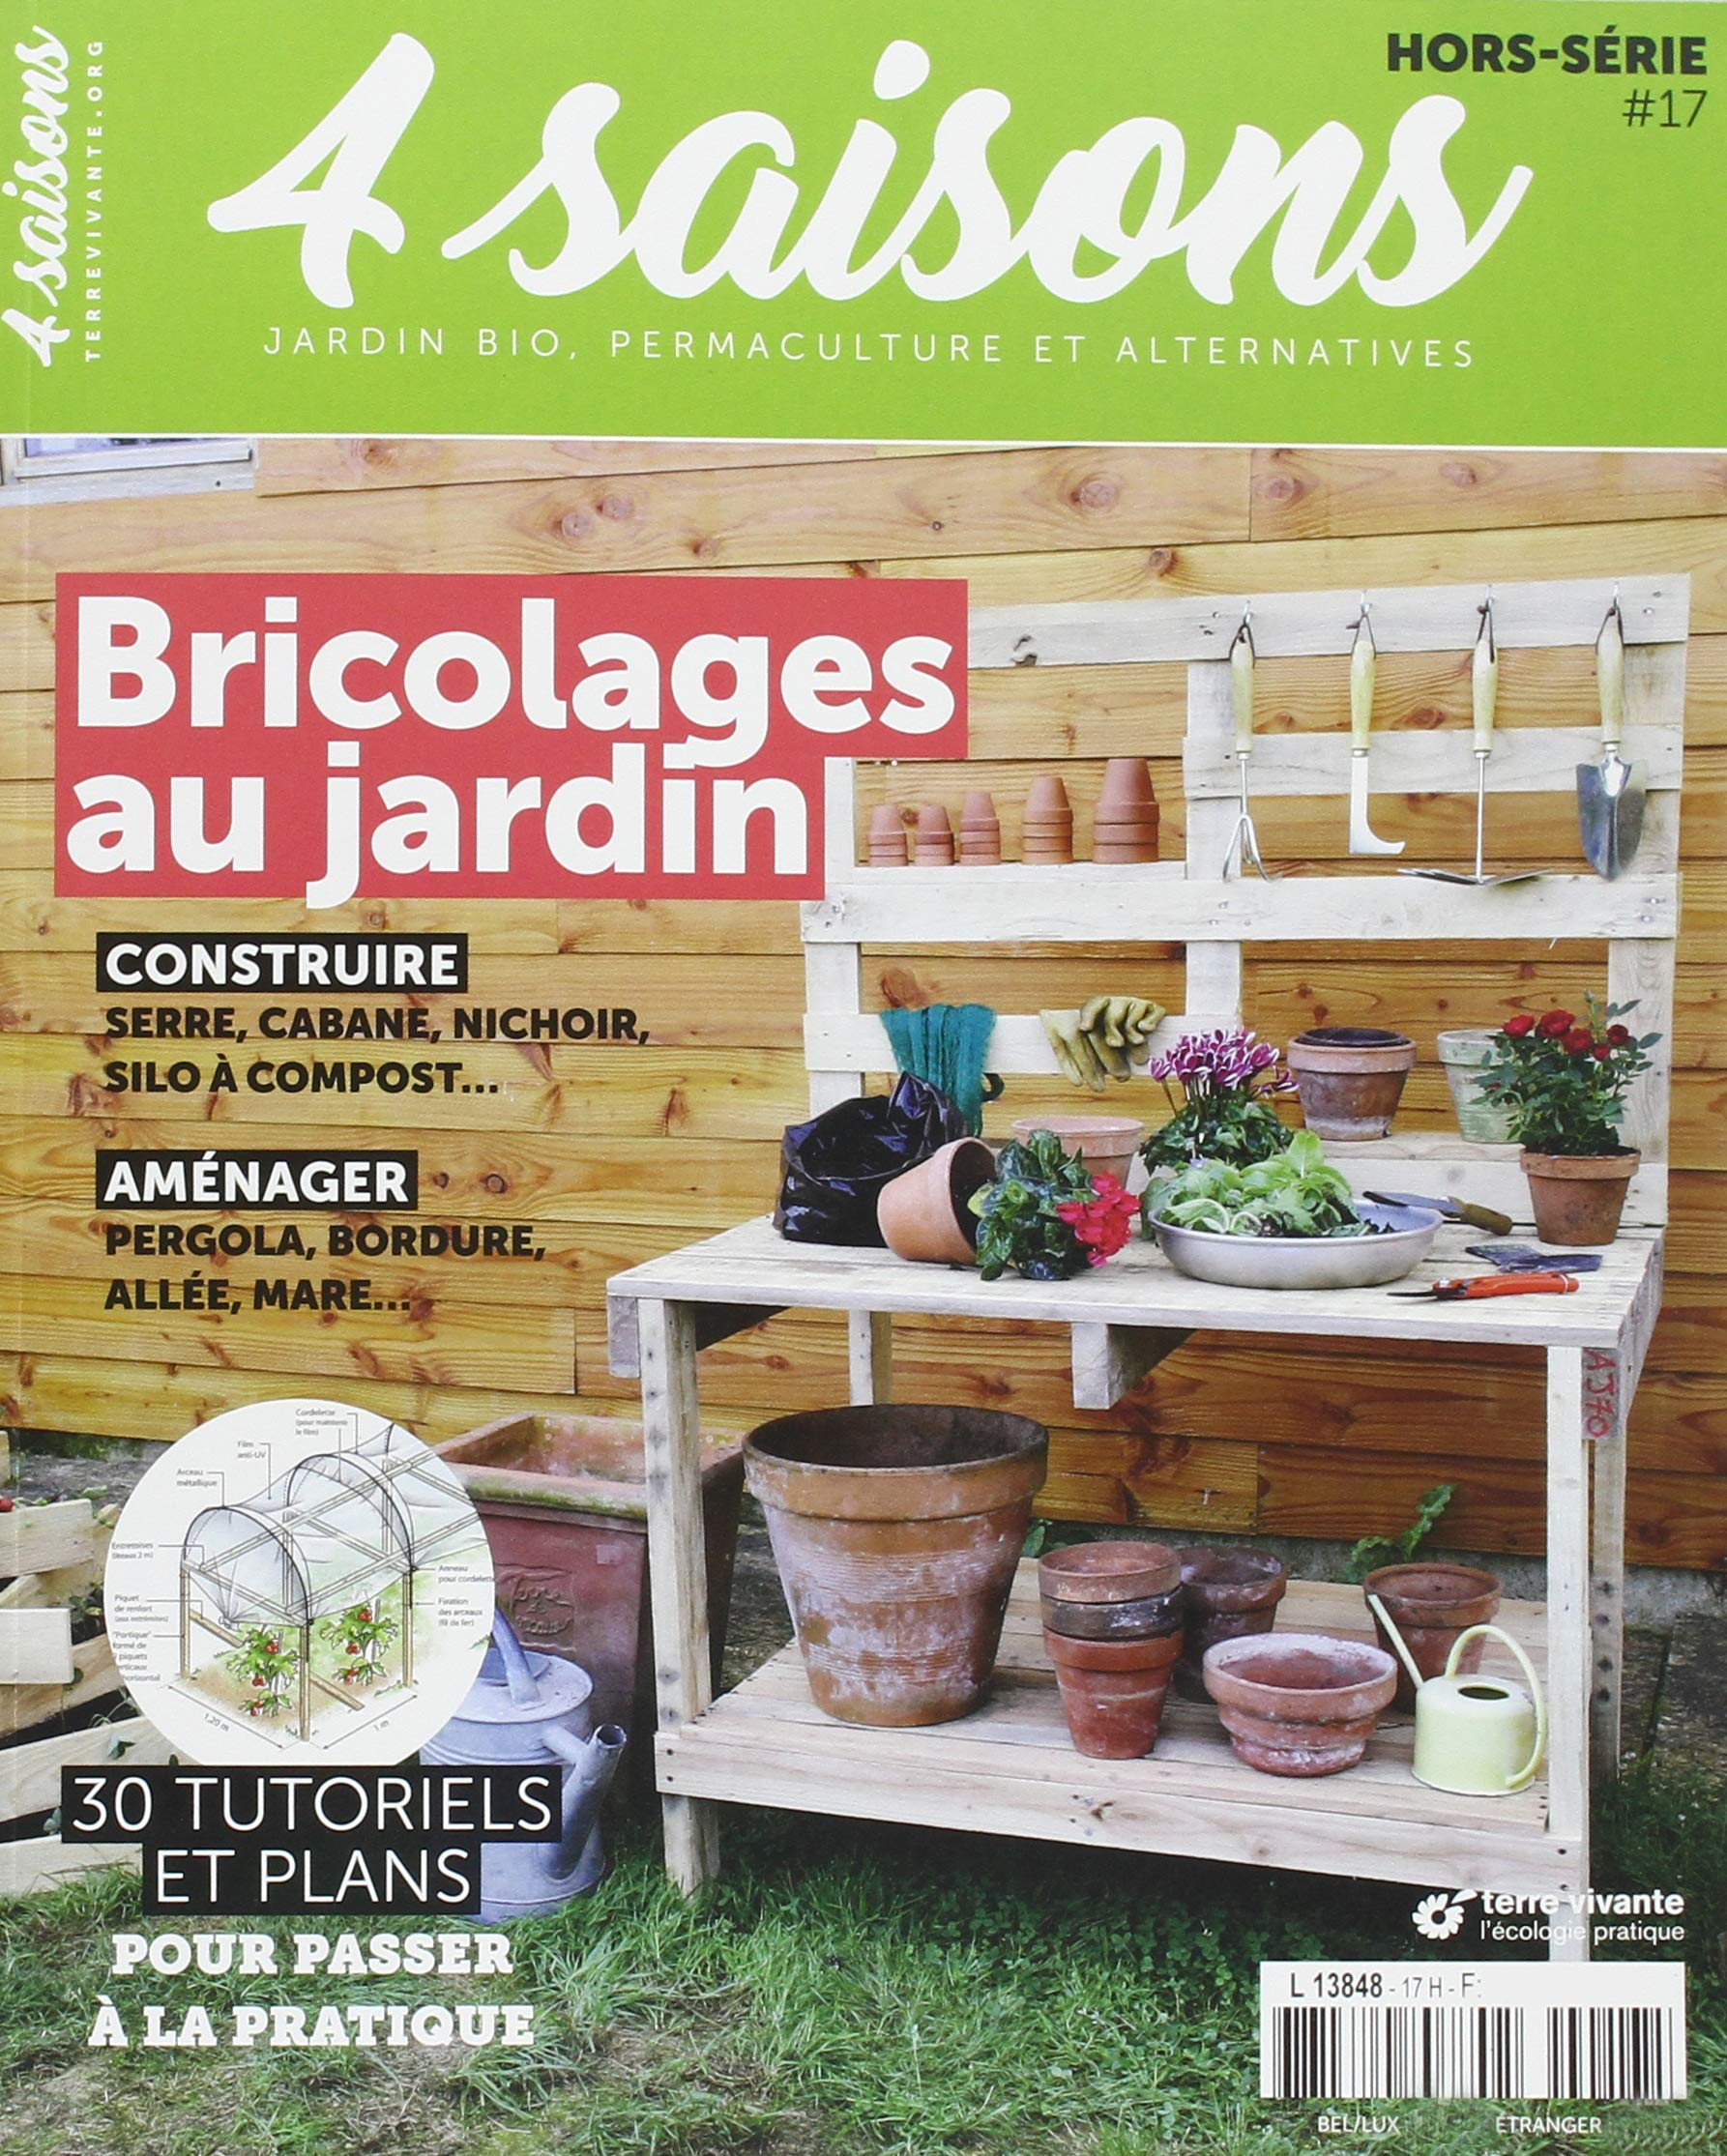 Revue 4 Saisons Hors Serie 17: Amazon.es: Libros en idiomas ...